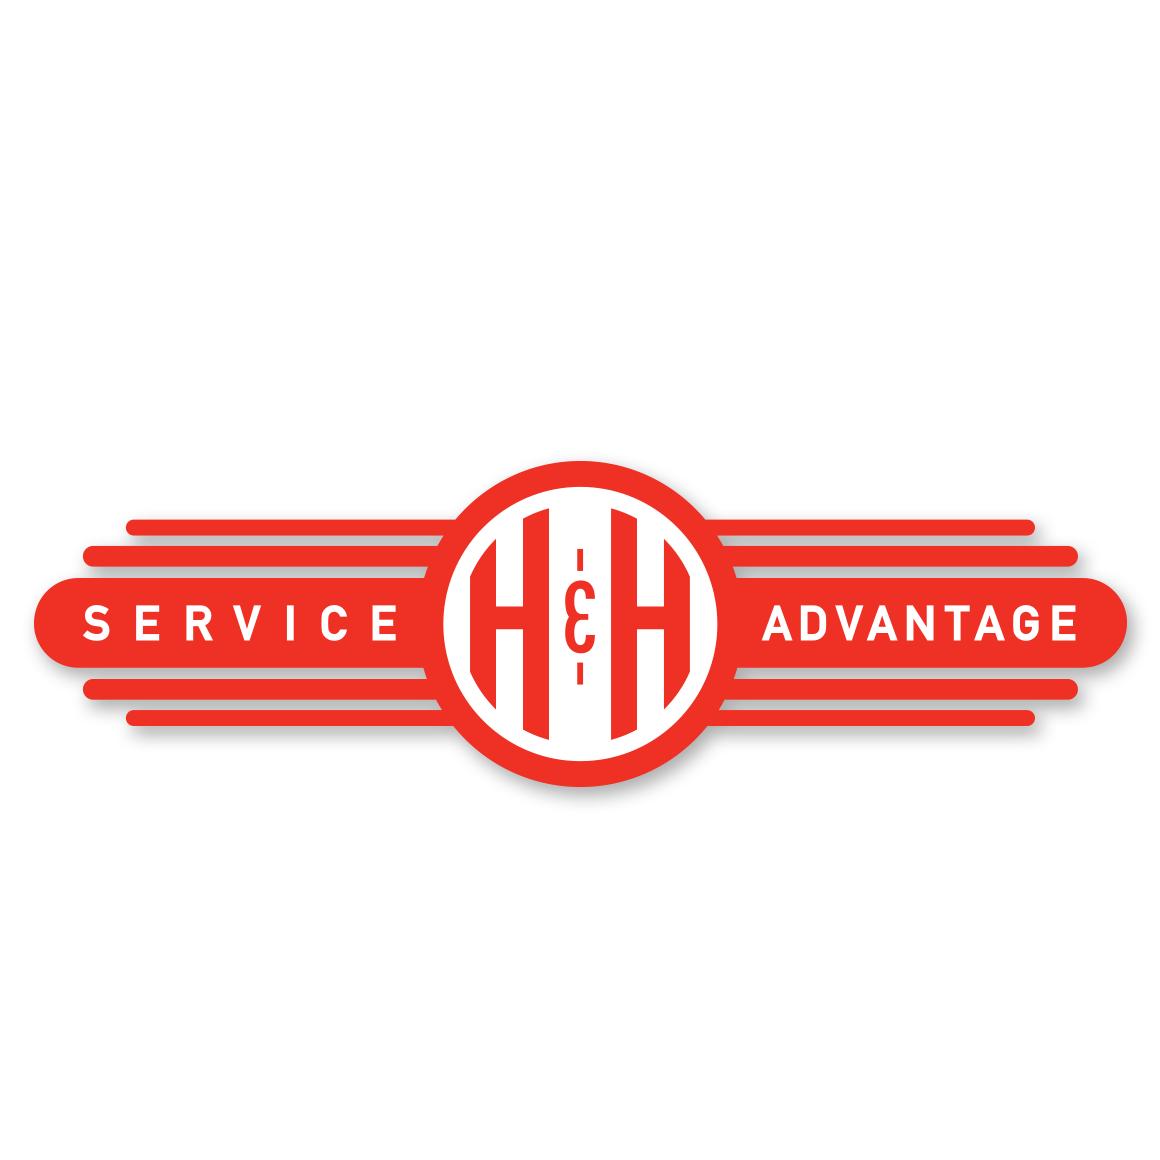 H & H Service Advantage